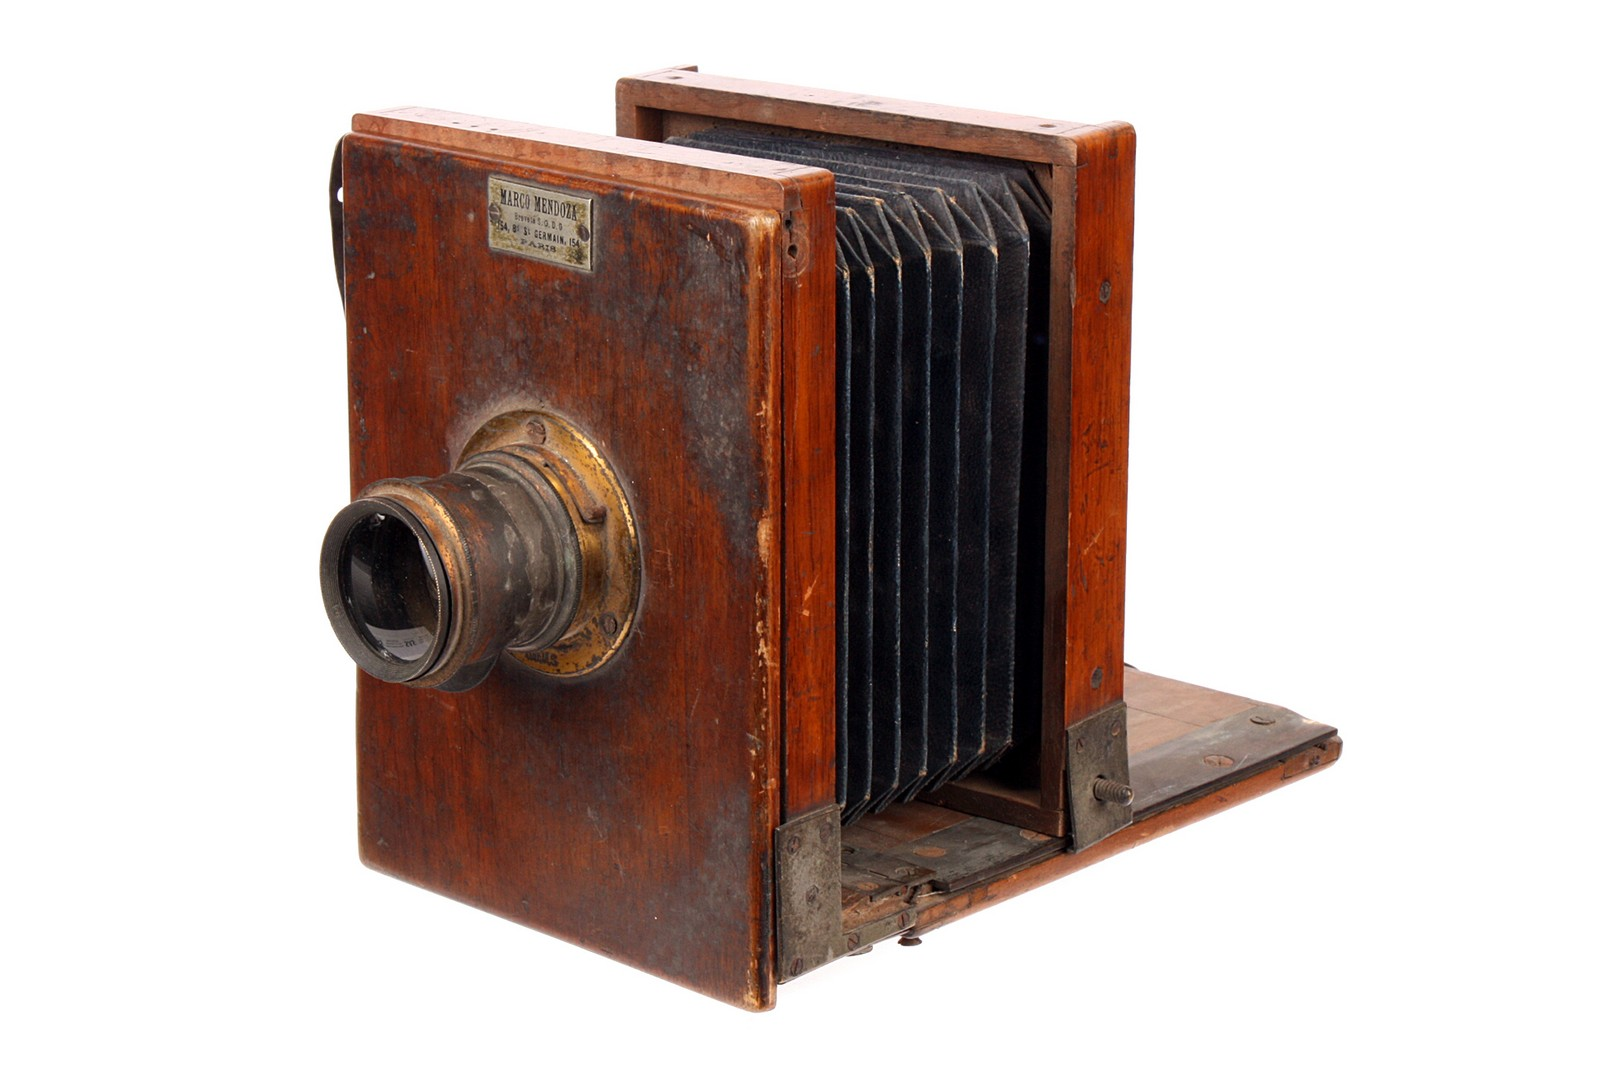 "A Marco Mendoza Mahogany Tailboard Camera, serial no. 6, 4x5"", with ..."